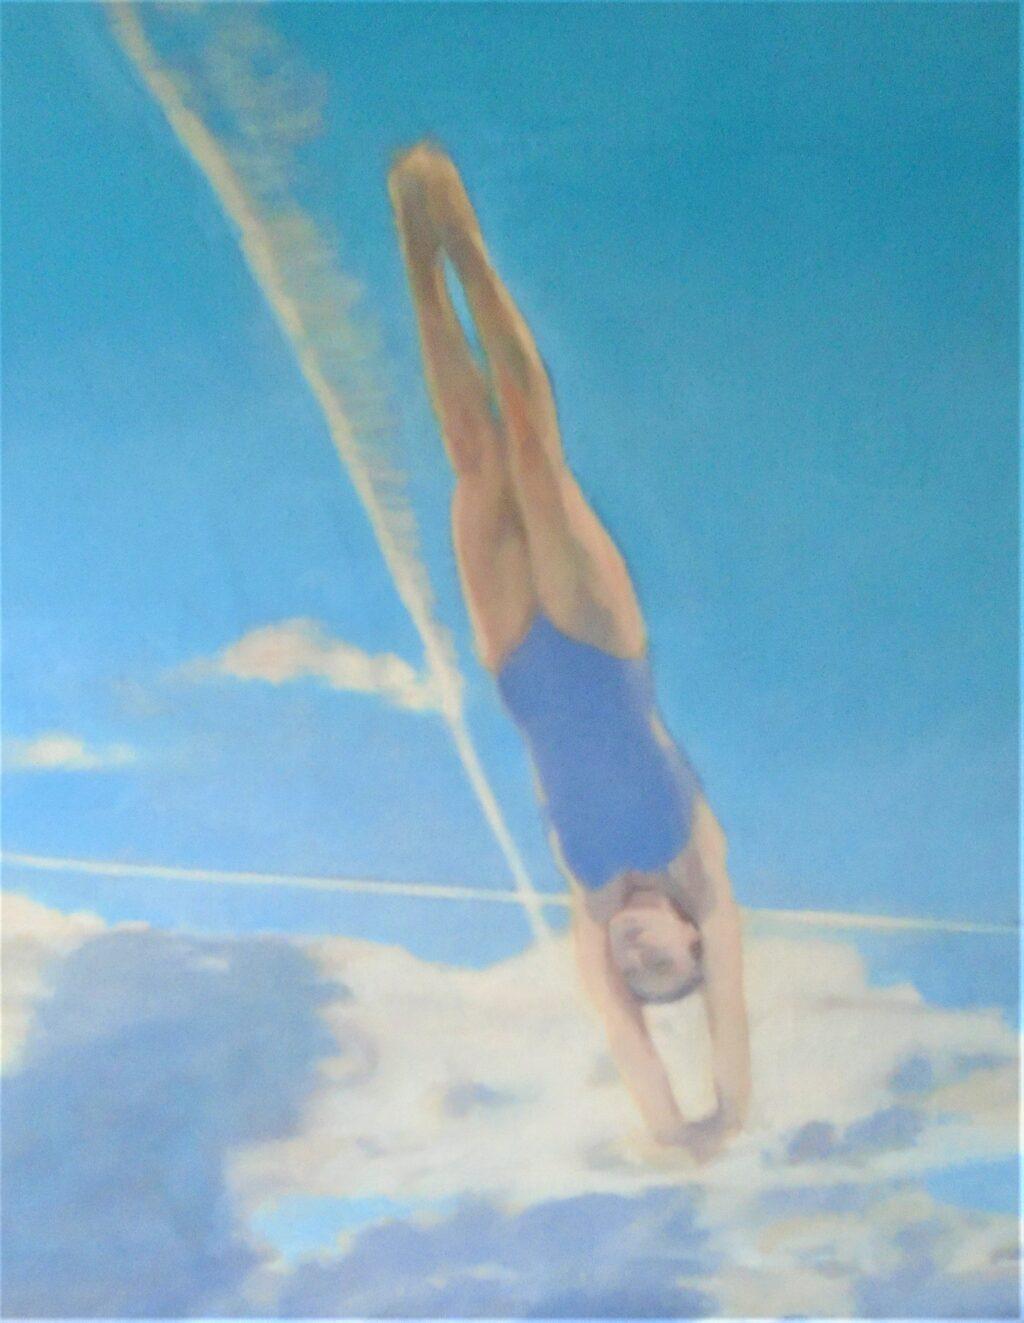 Harrogate Gallery, Tim Tudor